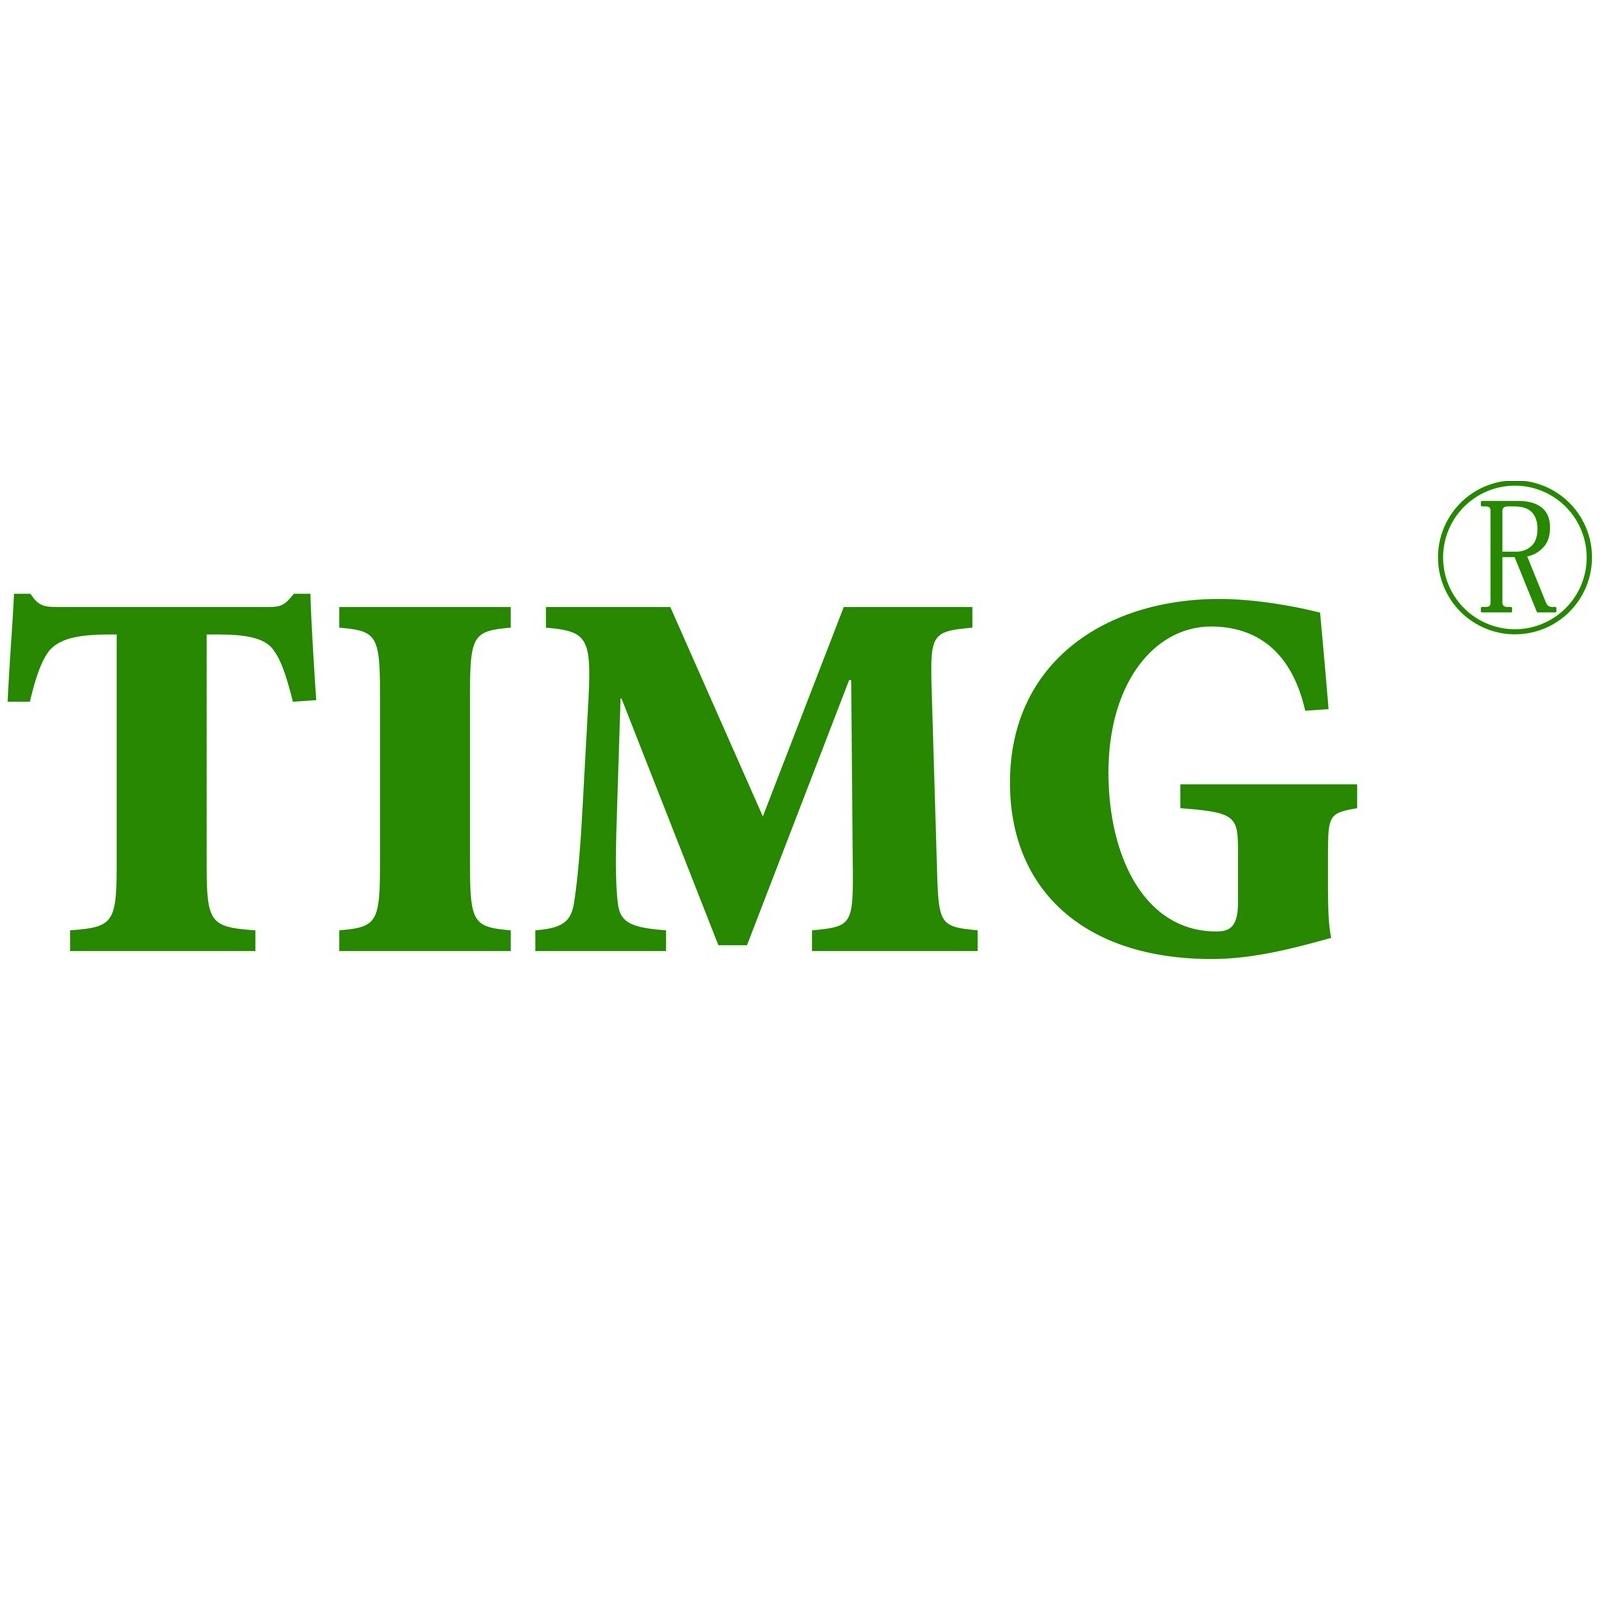 Shanghai Tim Growing Bearing Co., Ltd. | Technical Marketing Specialist (Korean Mkt) job in China | HiredChina.com | Make your next defining career in China | 招聘外国人